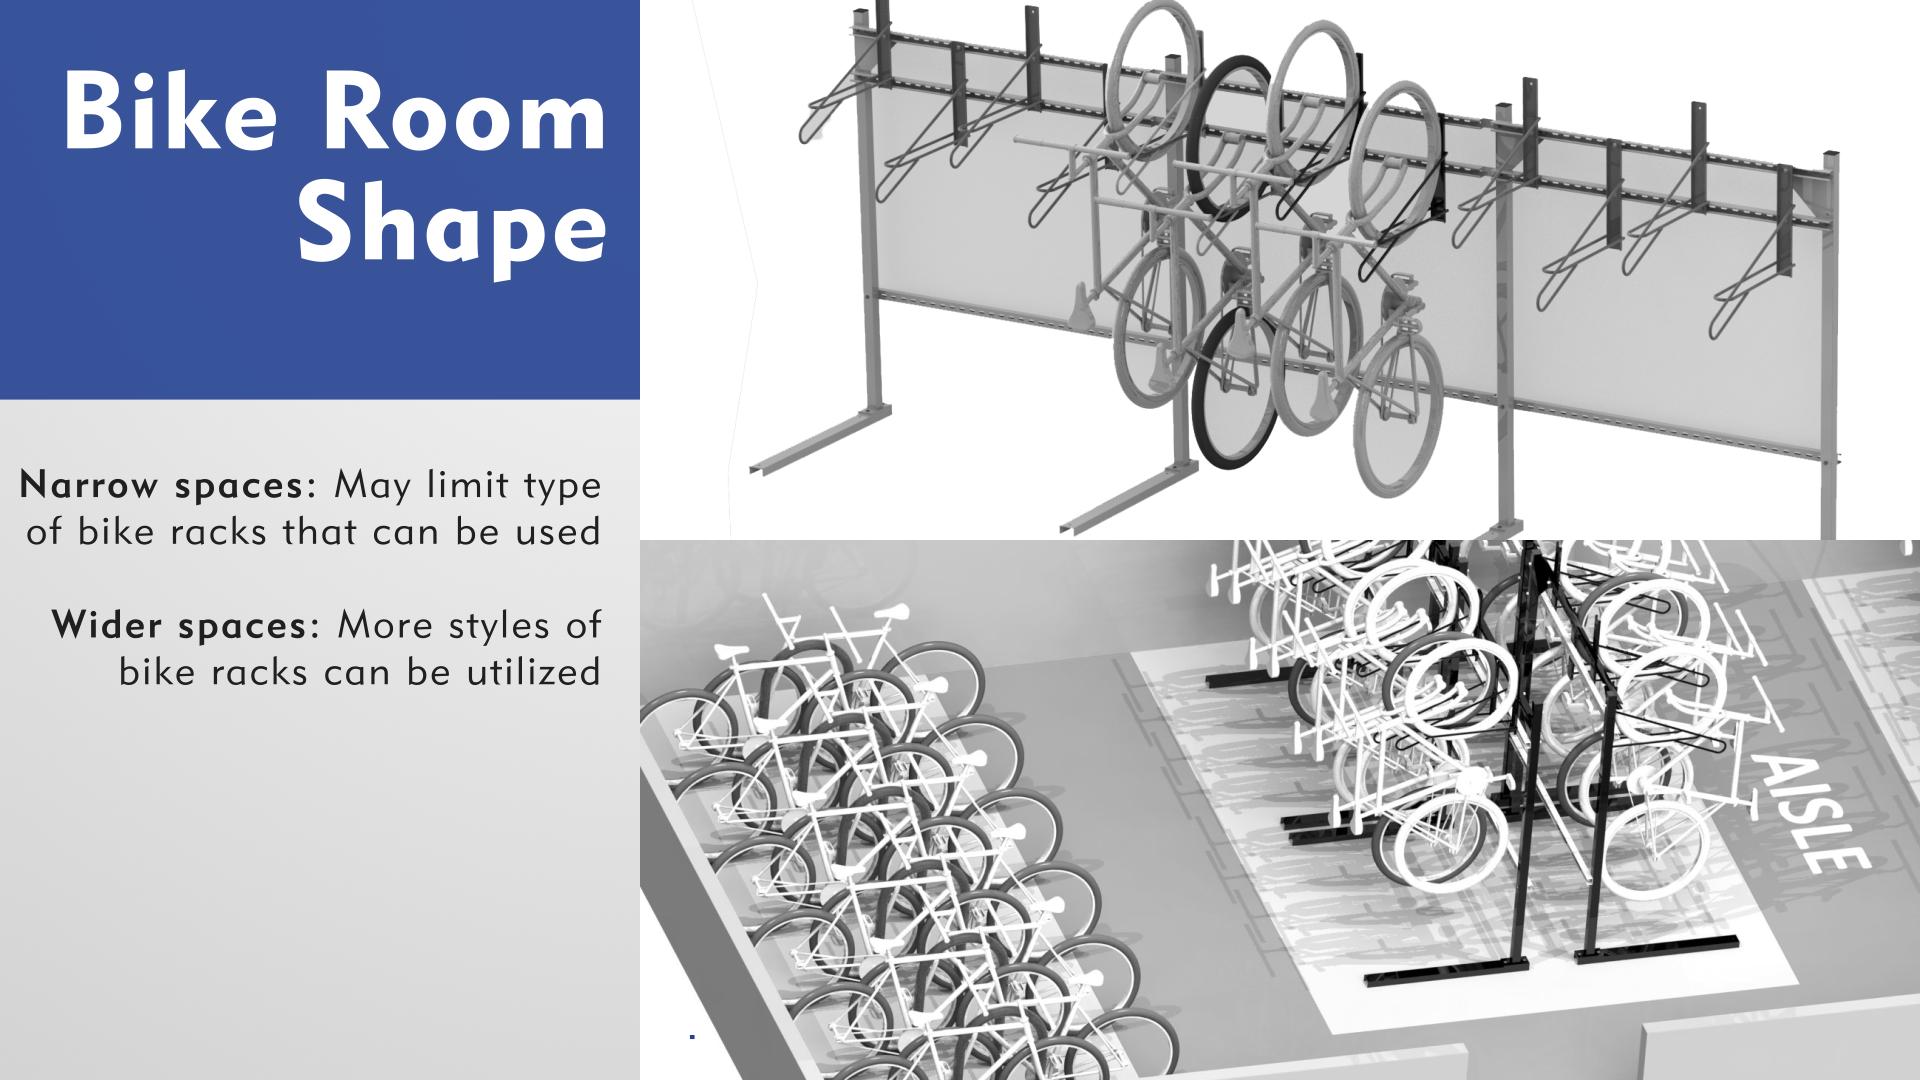 Bike-Room-Design-Tips-Bike-Room-Shape